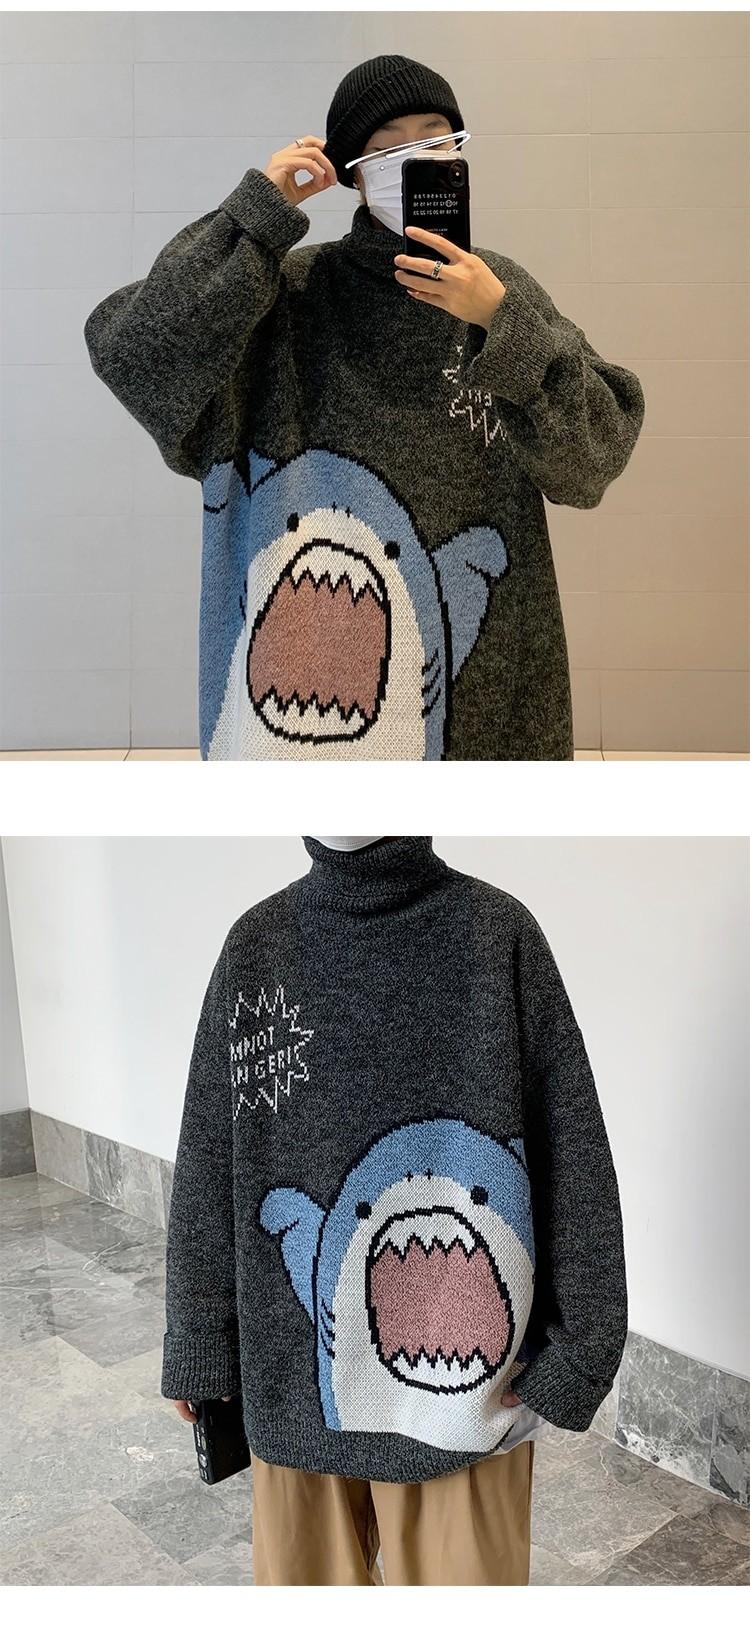 Harajuku E-boy E-girl Turtlenecks Oversized Shark Sweater 44